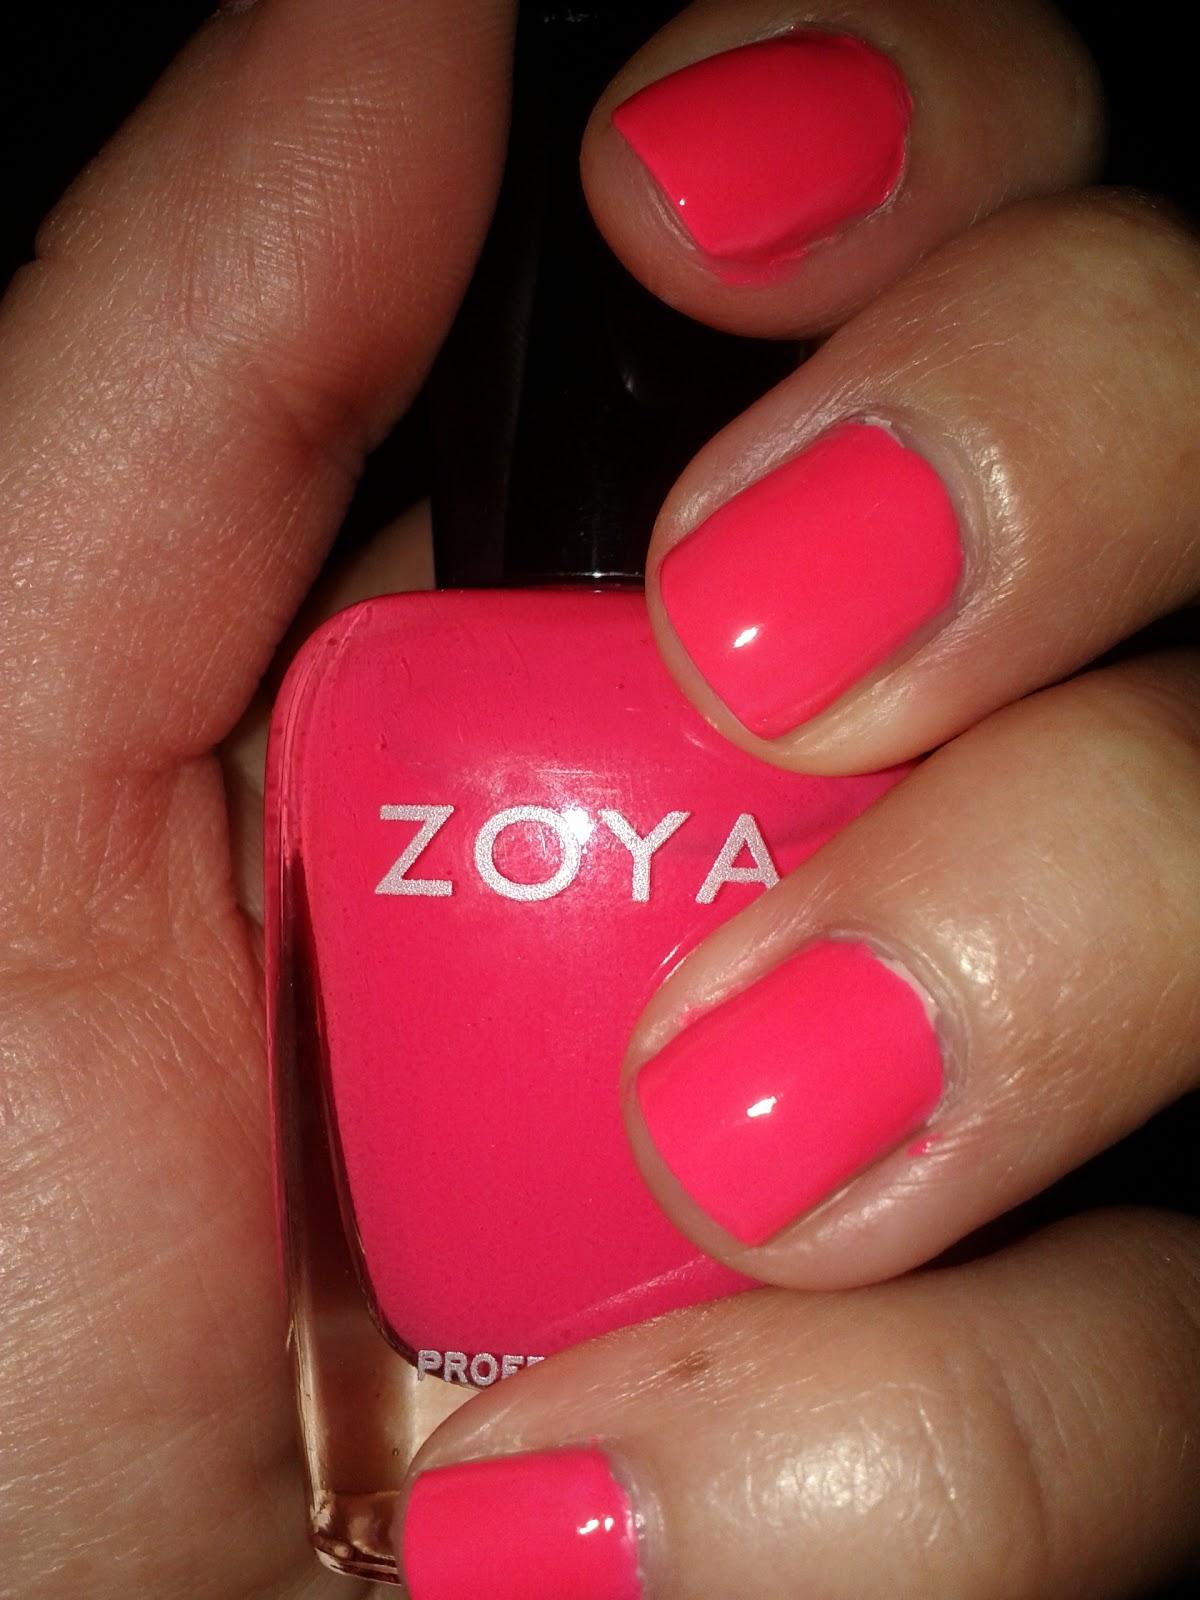 Lipgloss Break: zoya nail polish